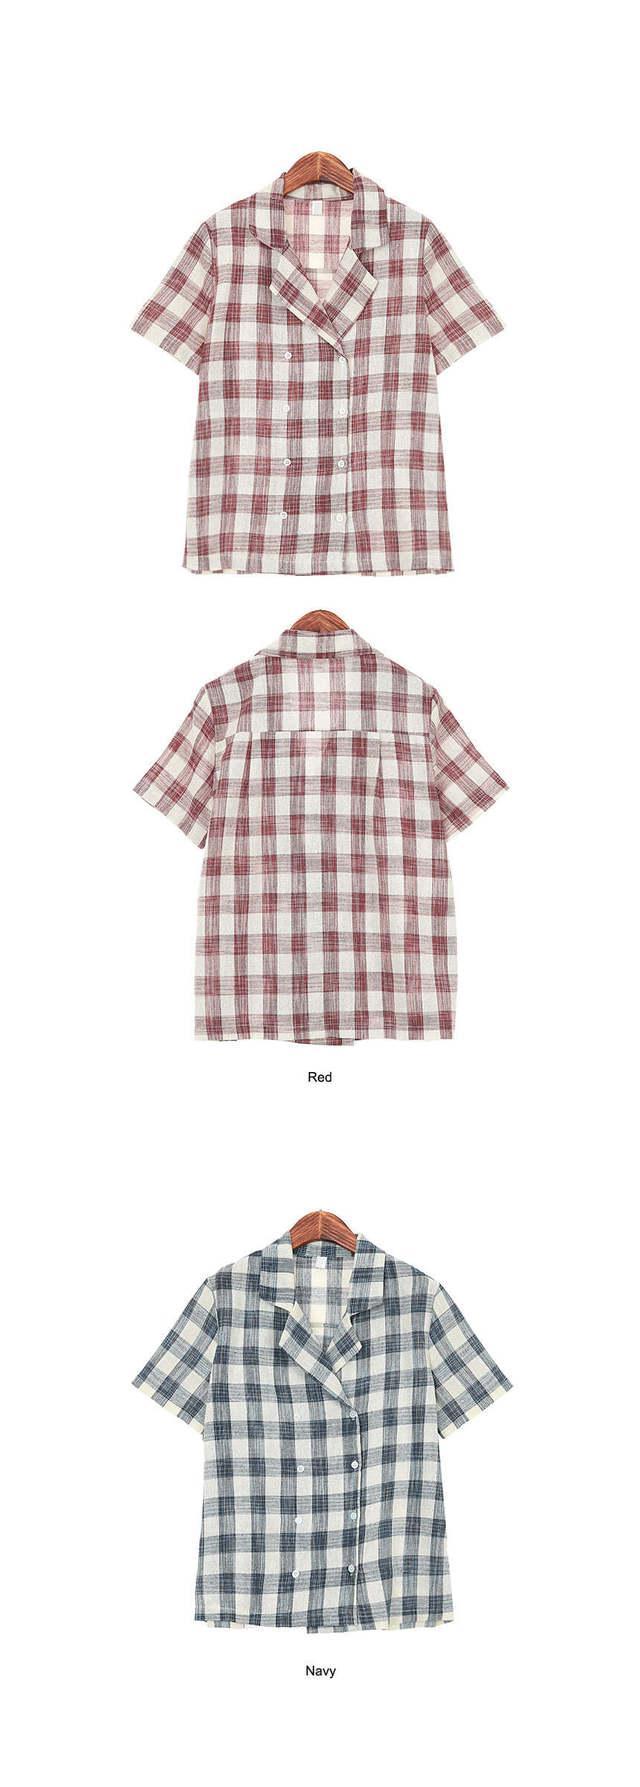 Lead Double Check Shirt